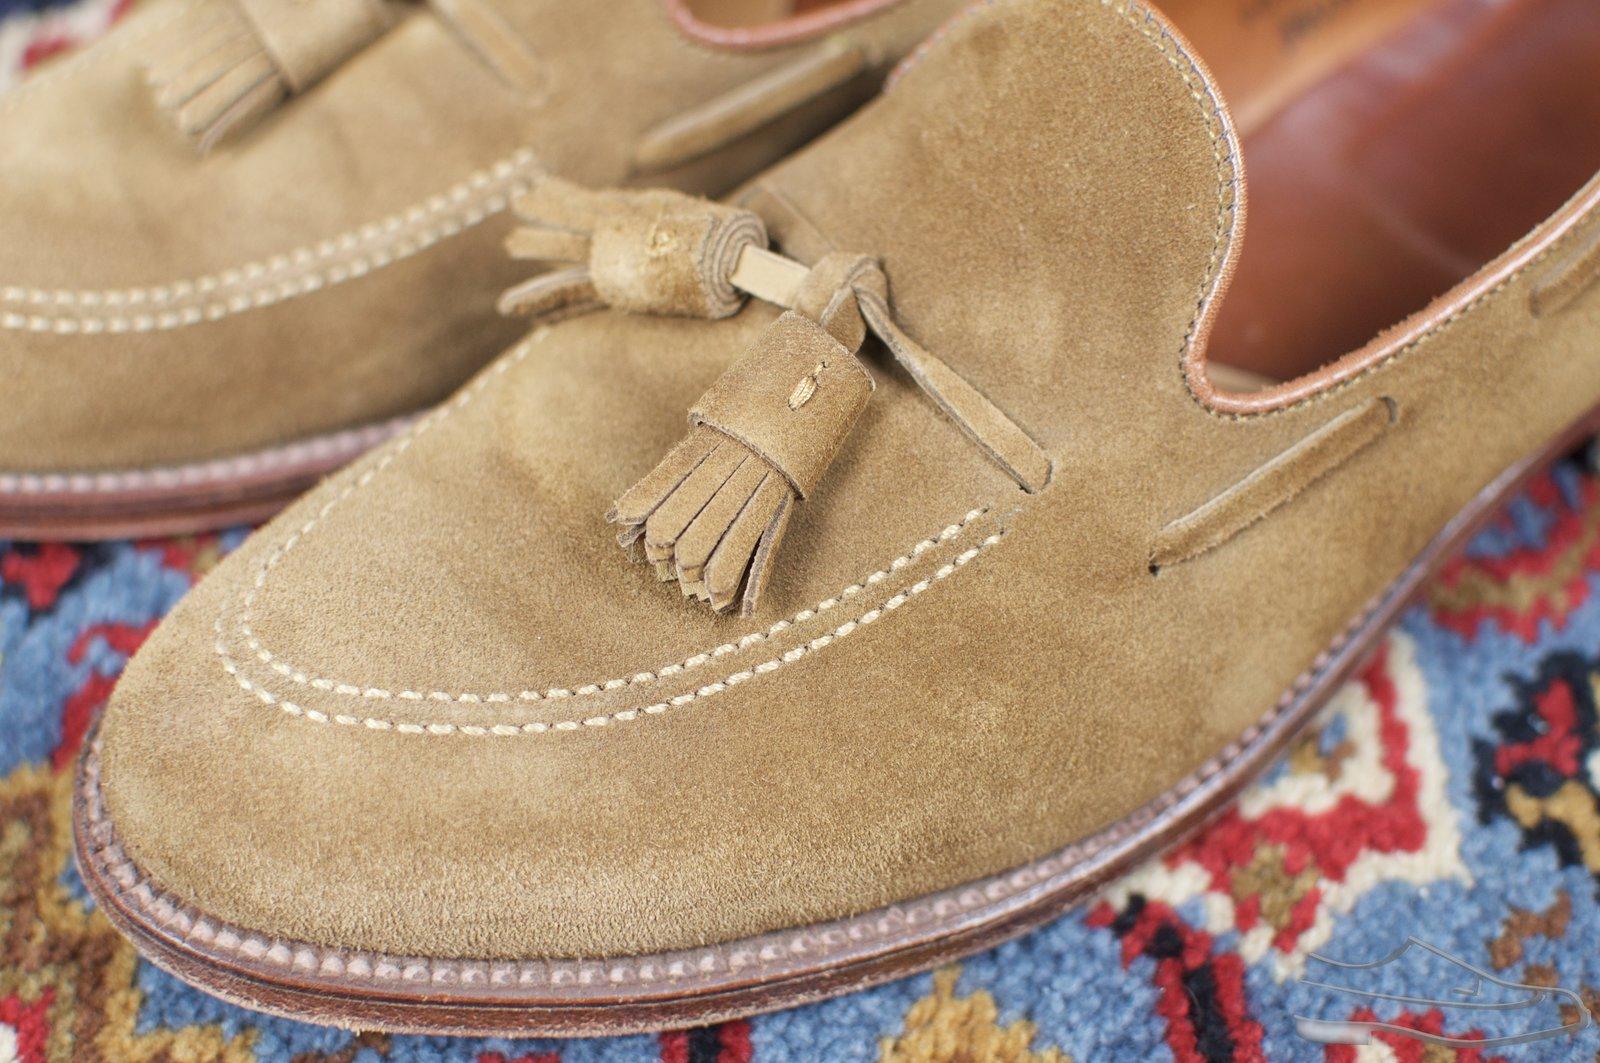 Alden Snuff Suede Tassel Loafers - 2020-09-19 - 2.jpg